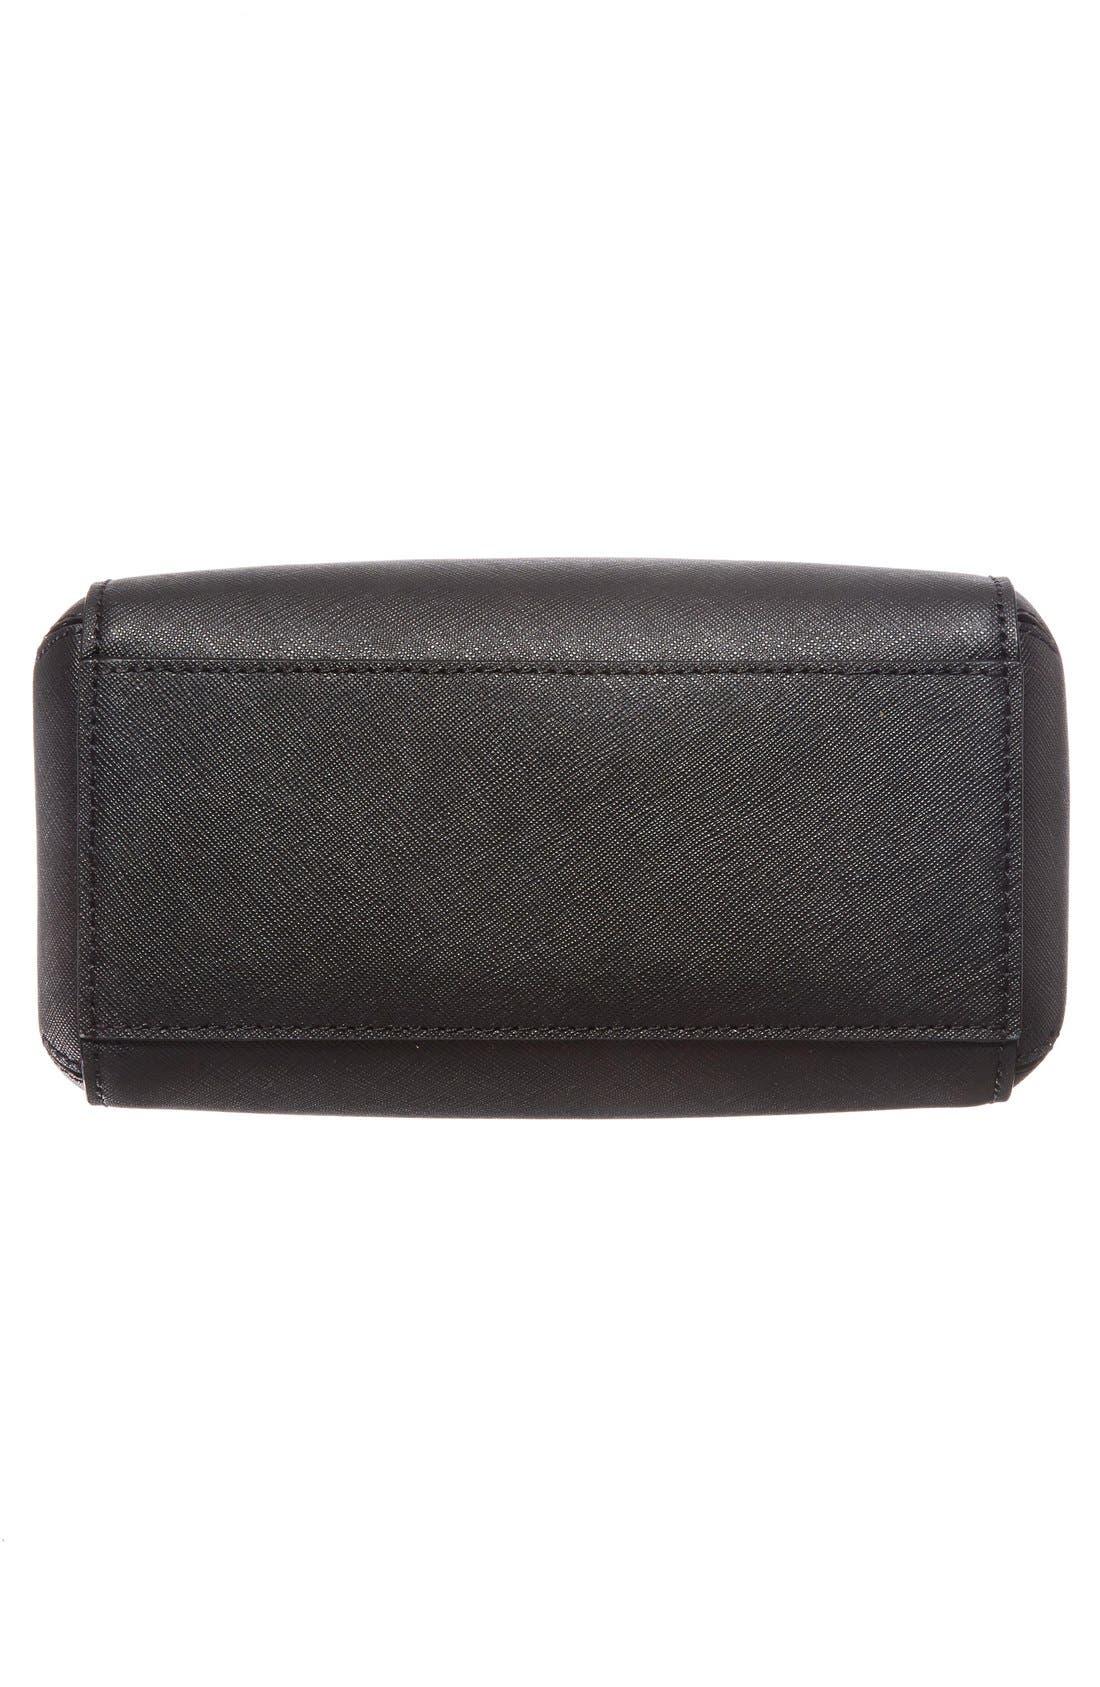 cameron street lane leather satchel,                             Alternate thumbnail 4, color,                             001